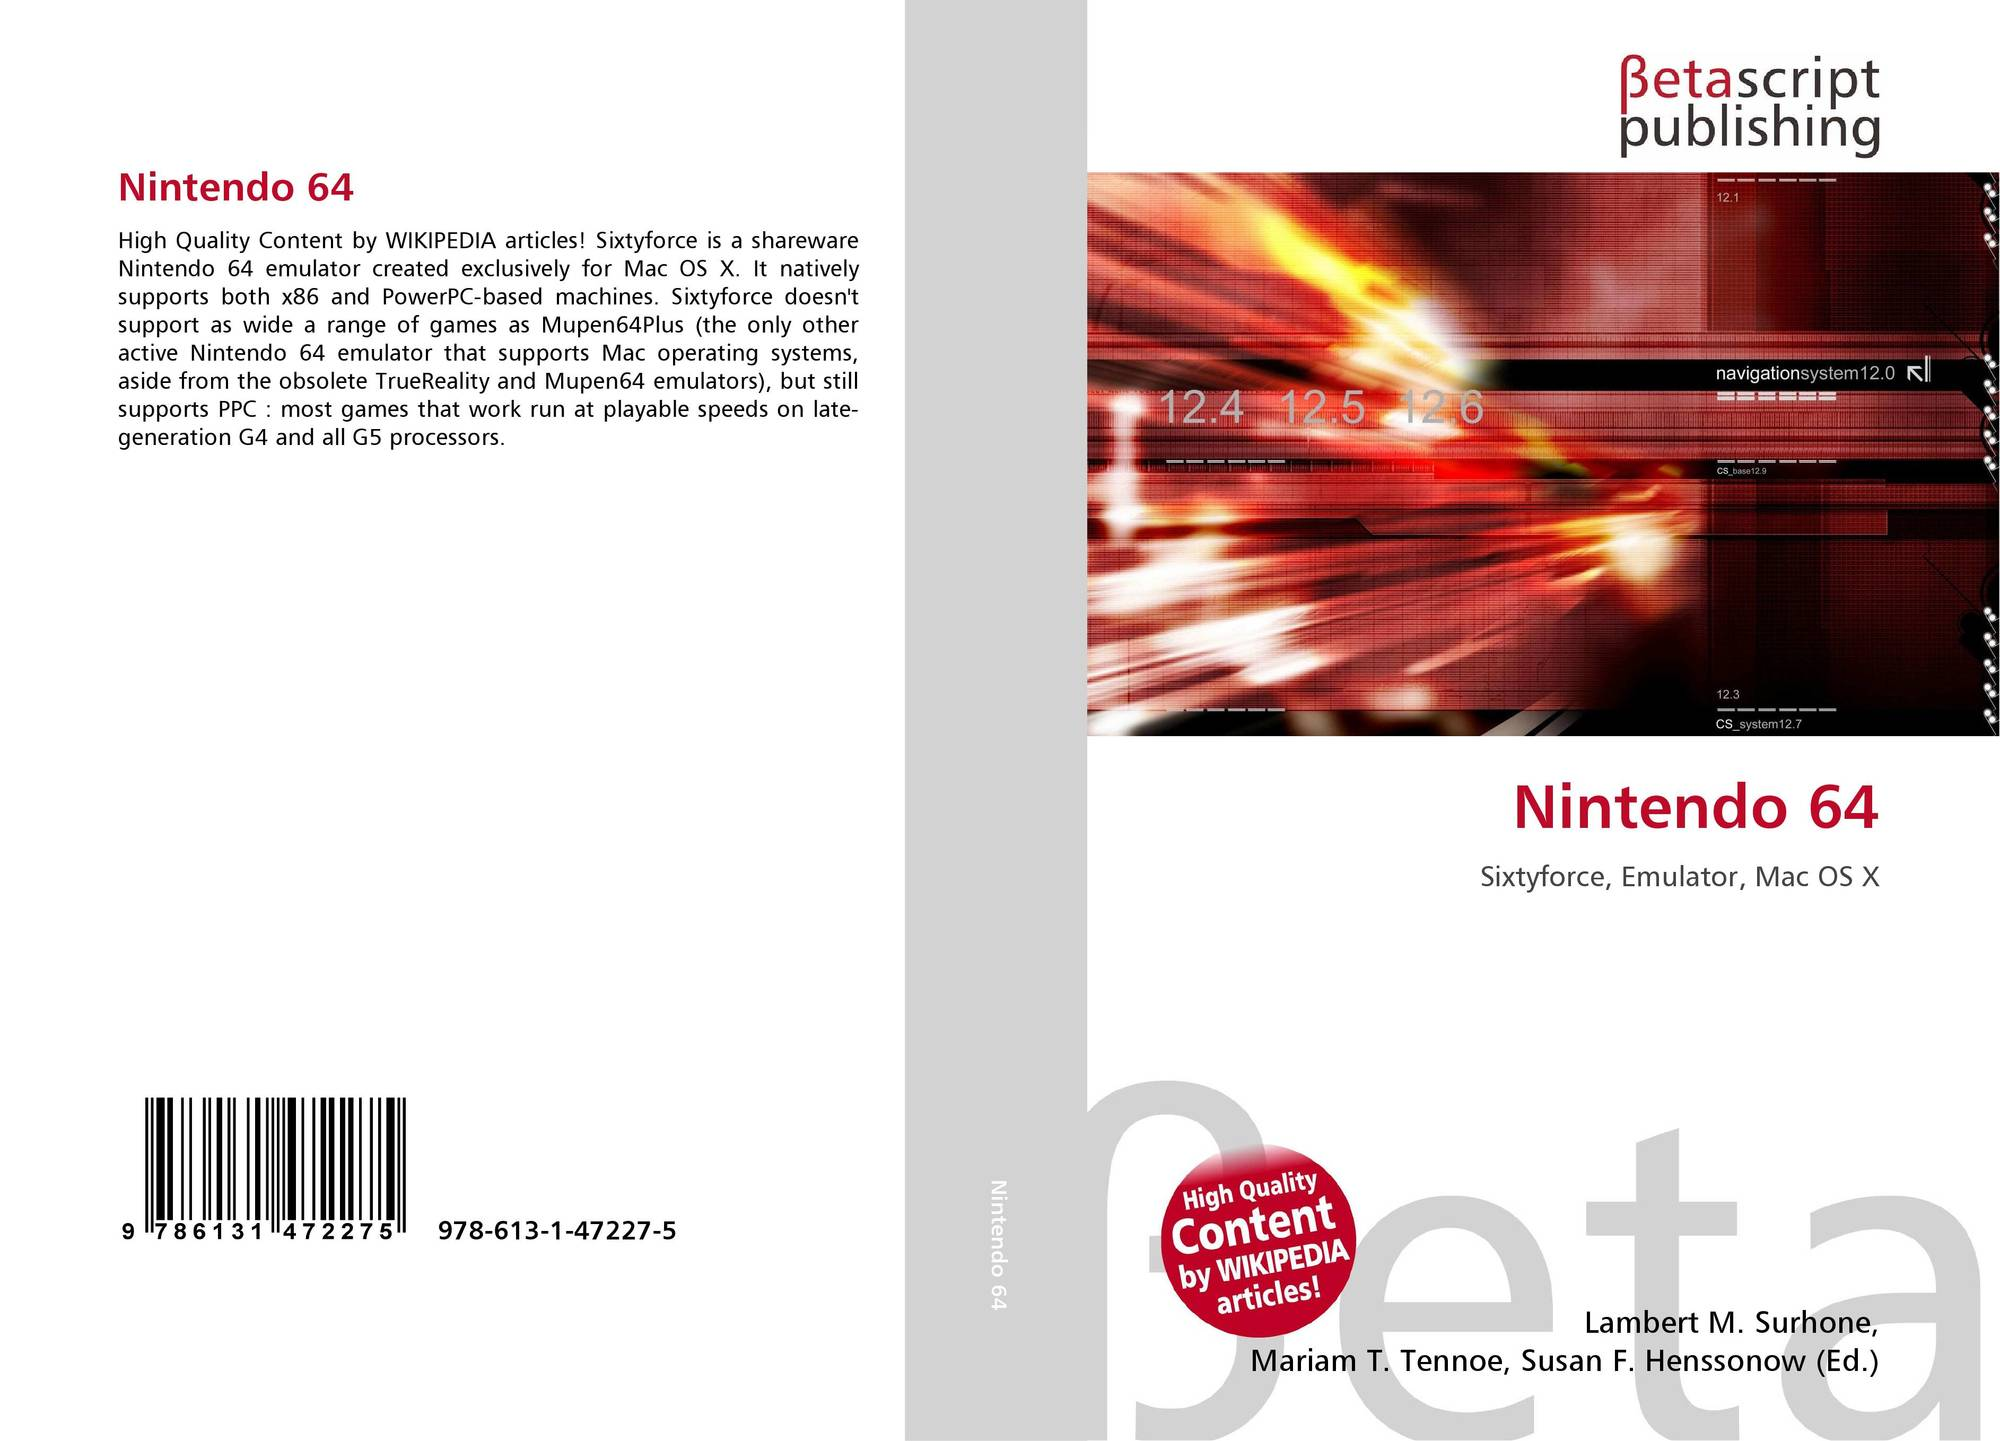 Nintendo 64, 978-613-1-47227-5, 6131472270 ,9786131472275